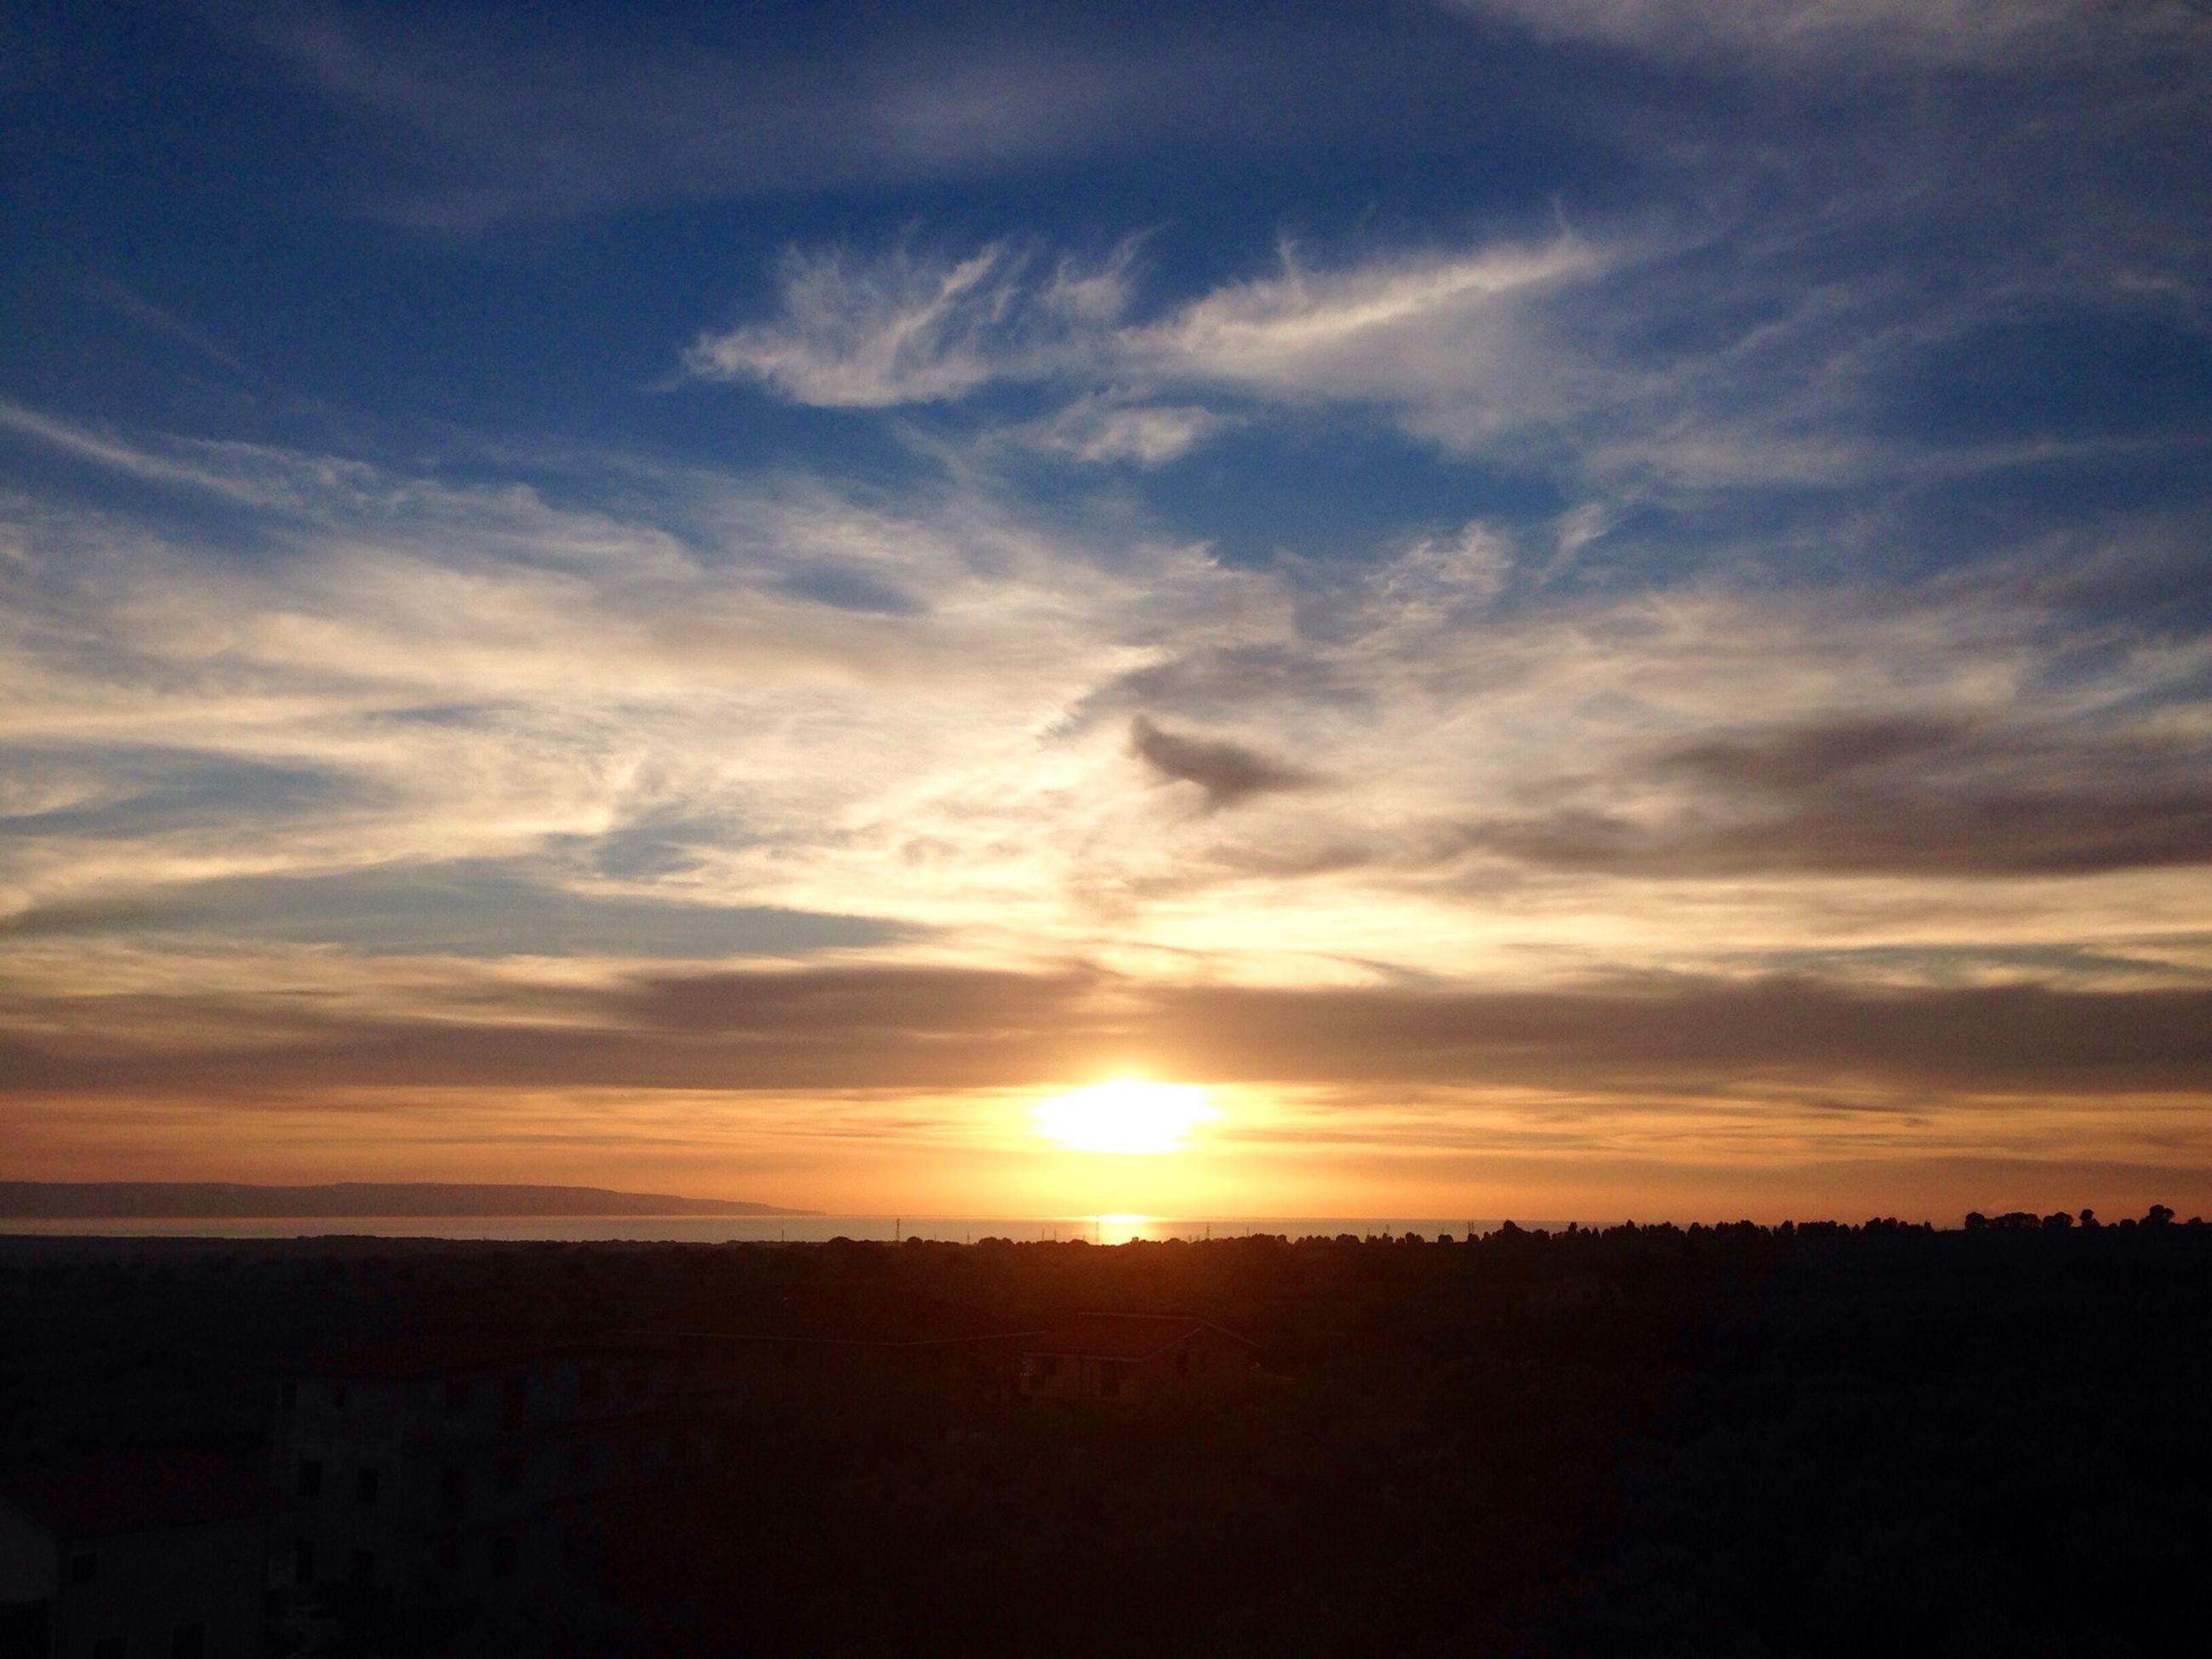 sunset, silhouette, sky, scenics, beauty in nature, tranquil scene, sun, cloud - sky, tranquility, orange color, landscape, nature, idyllic, cloud, sunlight, cloudy, dramatic sky, outdoors, sunbeam, moody sky